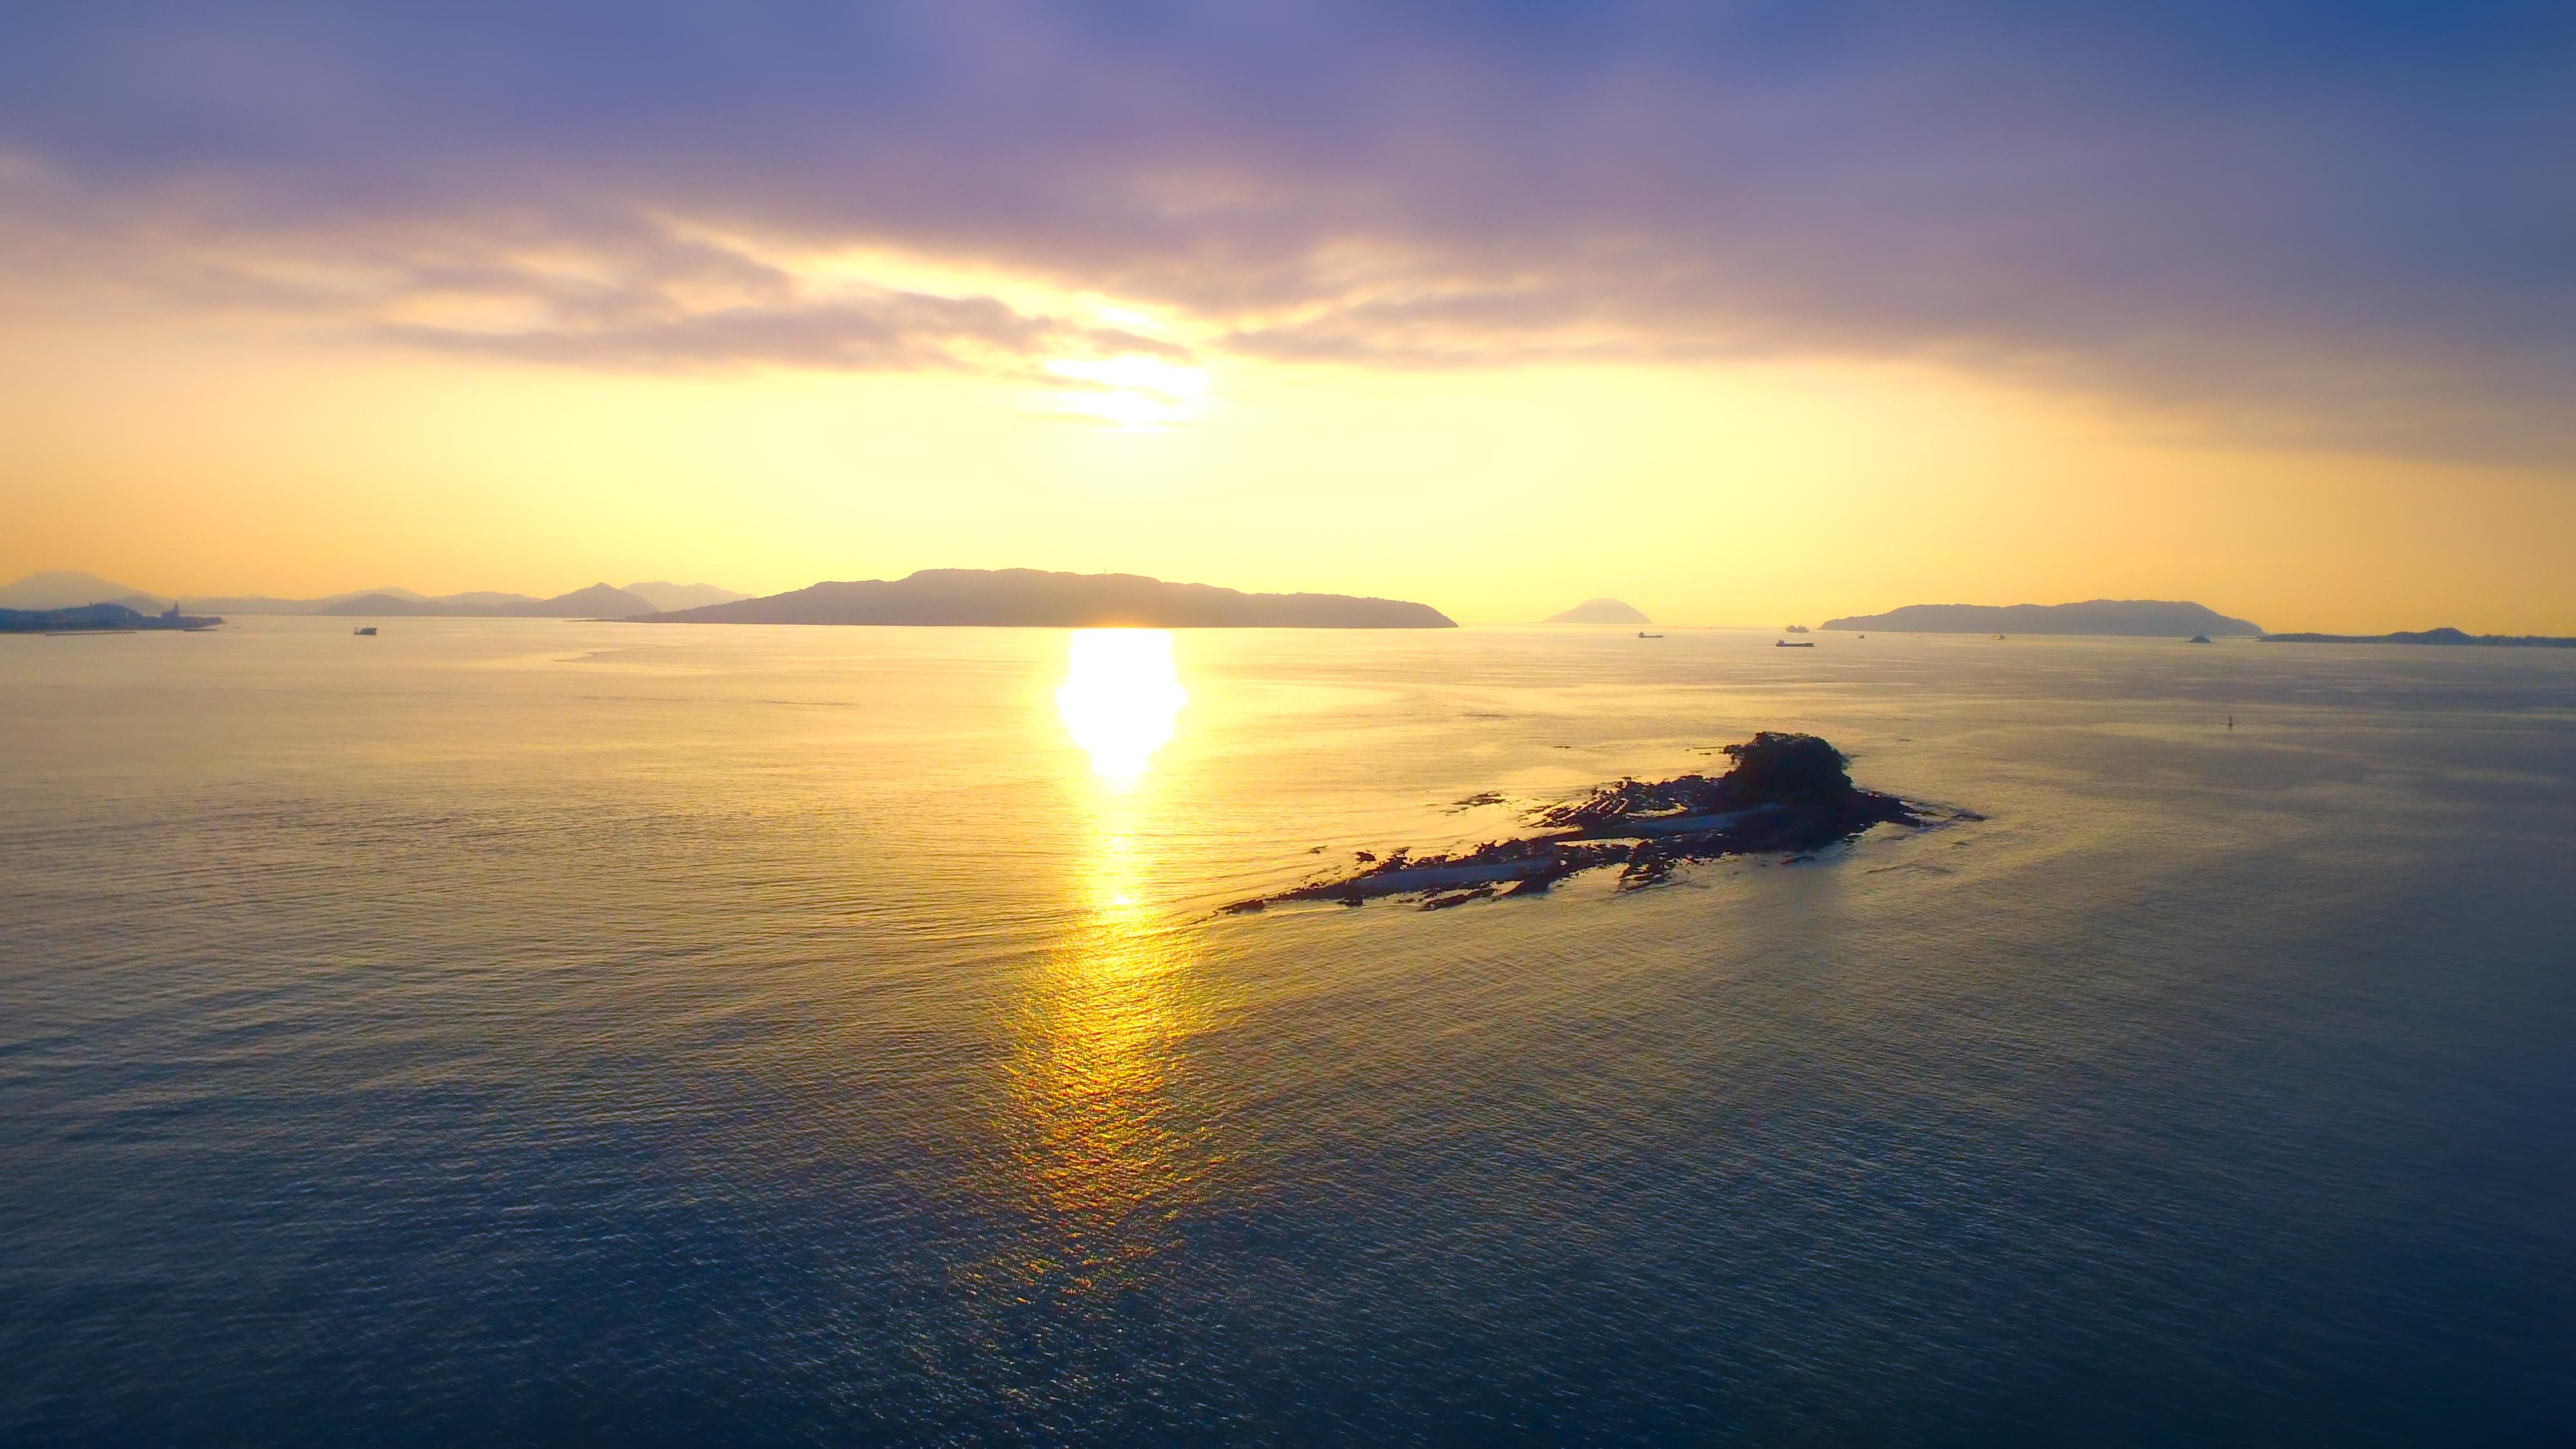 Uginoshima Island